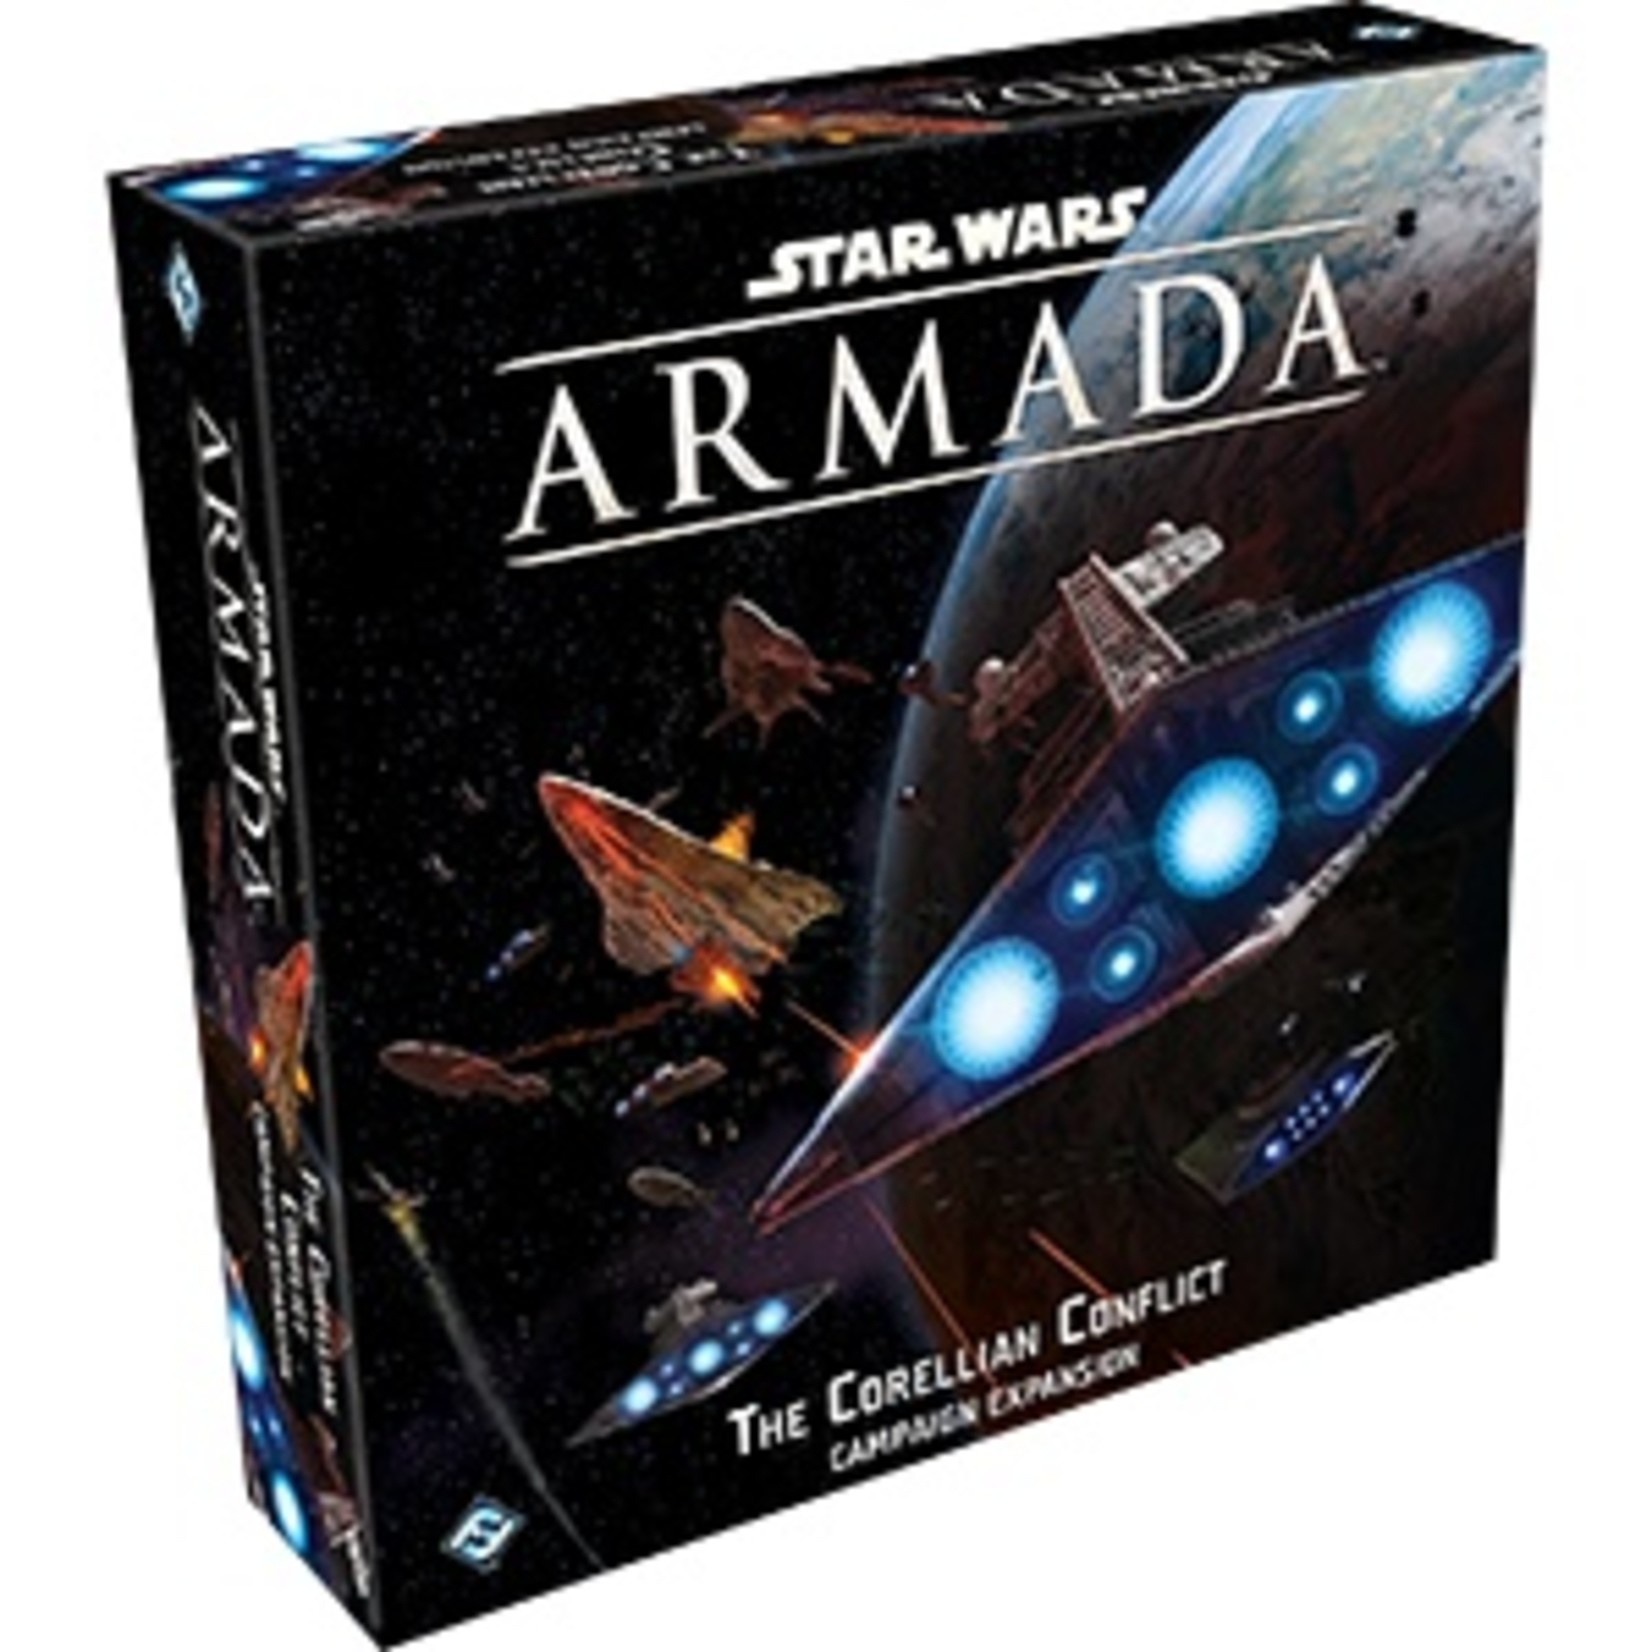 Fantasy Flight Games SW Armada Corellian Conflict Campaign expansion